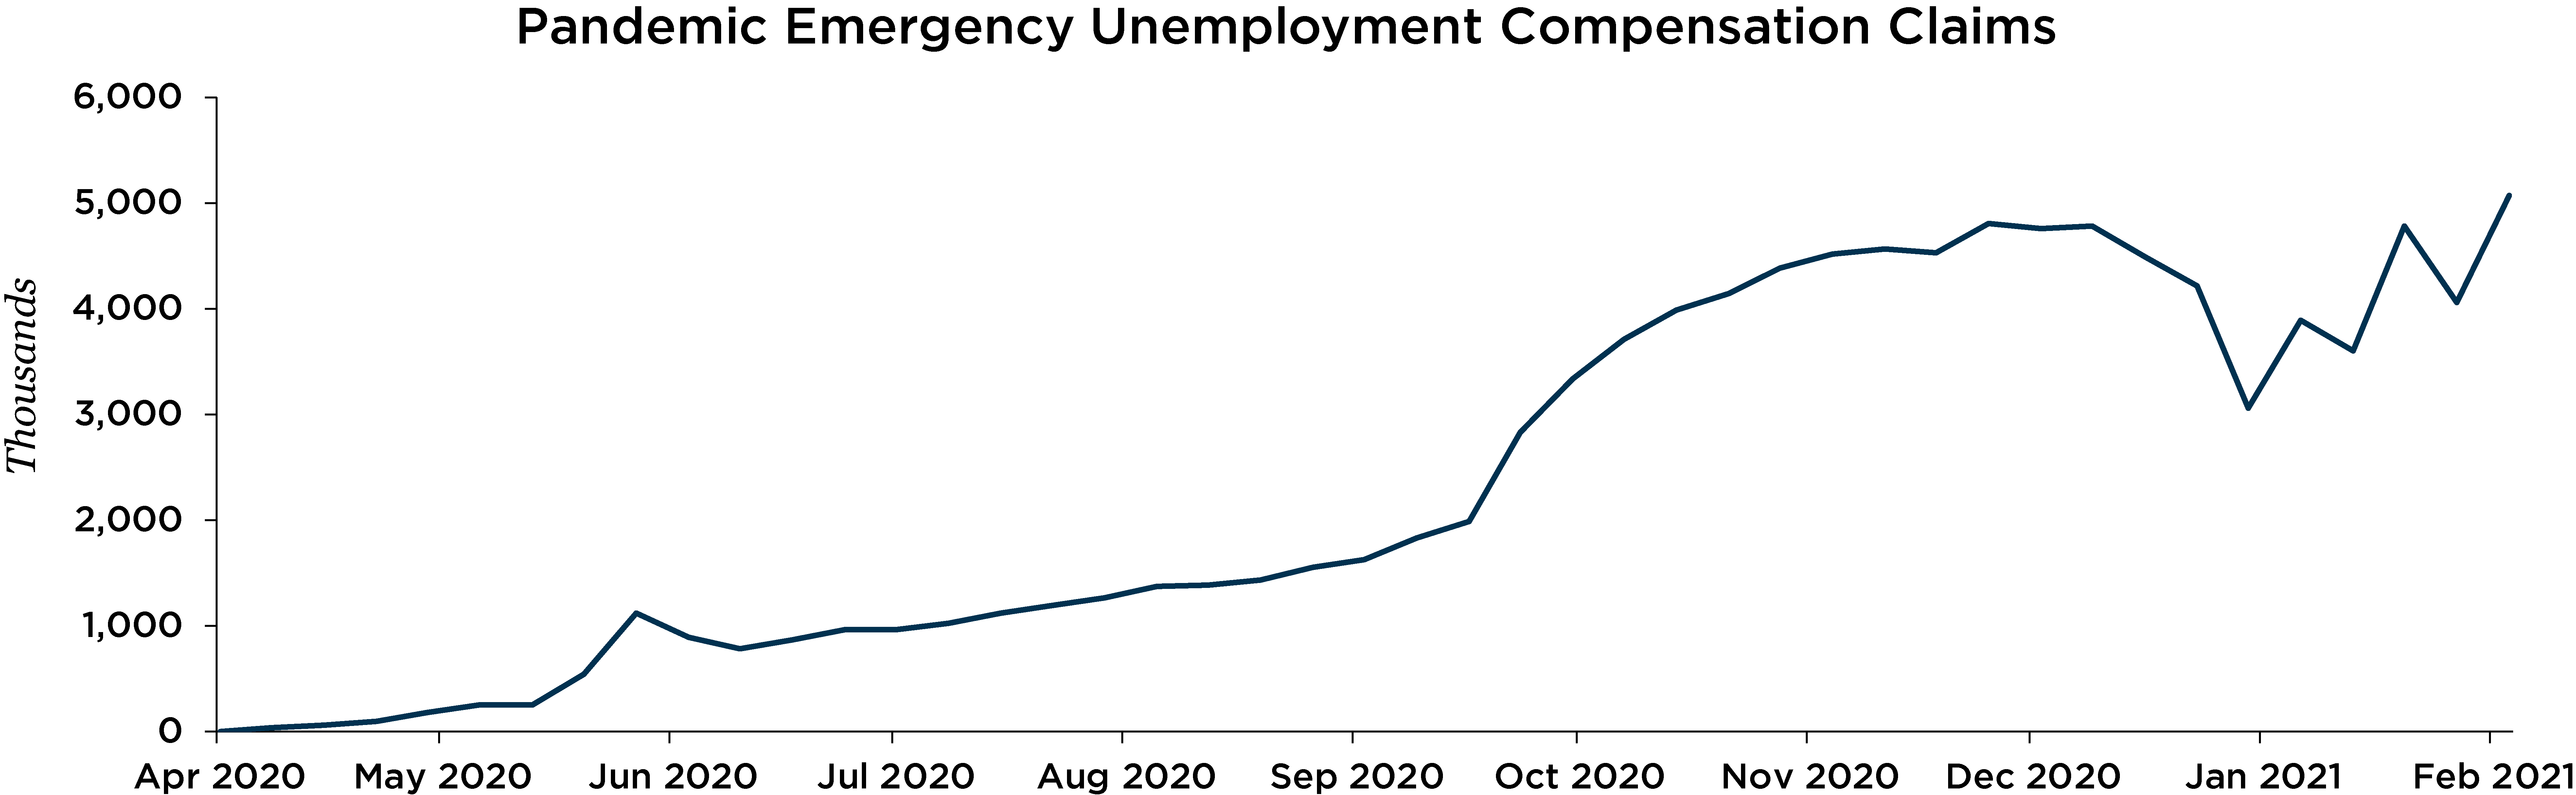 Graph depicting Pandemic Emergency Unemployment Compensation Claims